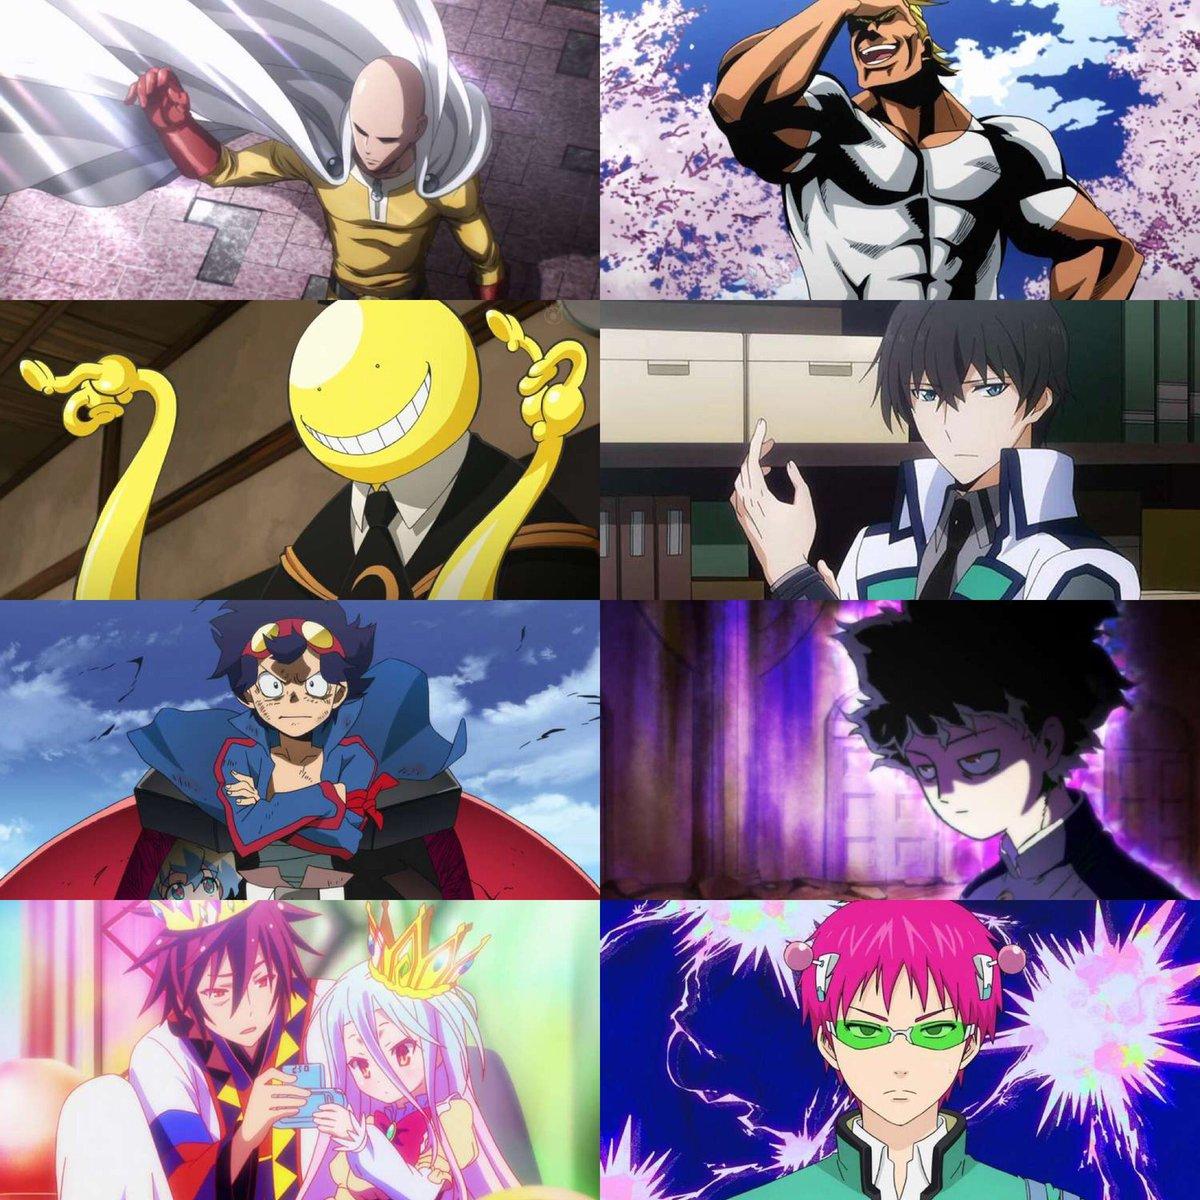 Anime characters who technically never lost a fight   #OnePunchMan #MyHeroAcademia #AssassinationClassroom #IrregularatMagicHighSchool #gurrenlagann #saikik #mobpsycho100 #nogamenolife #anime #animation #AniList #Anitwt #manga #ALLMIGHT #saitama #saiki